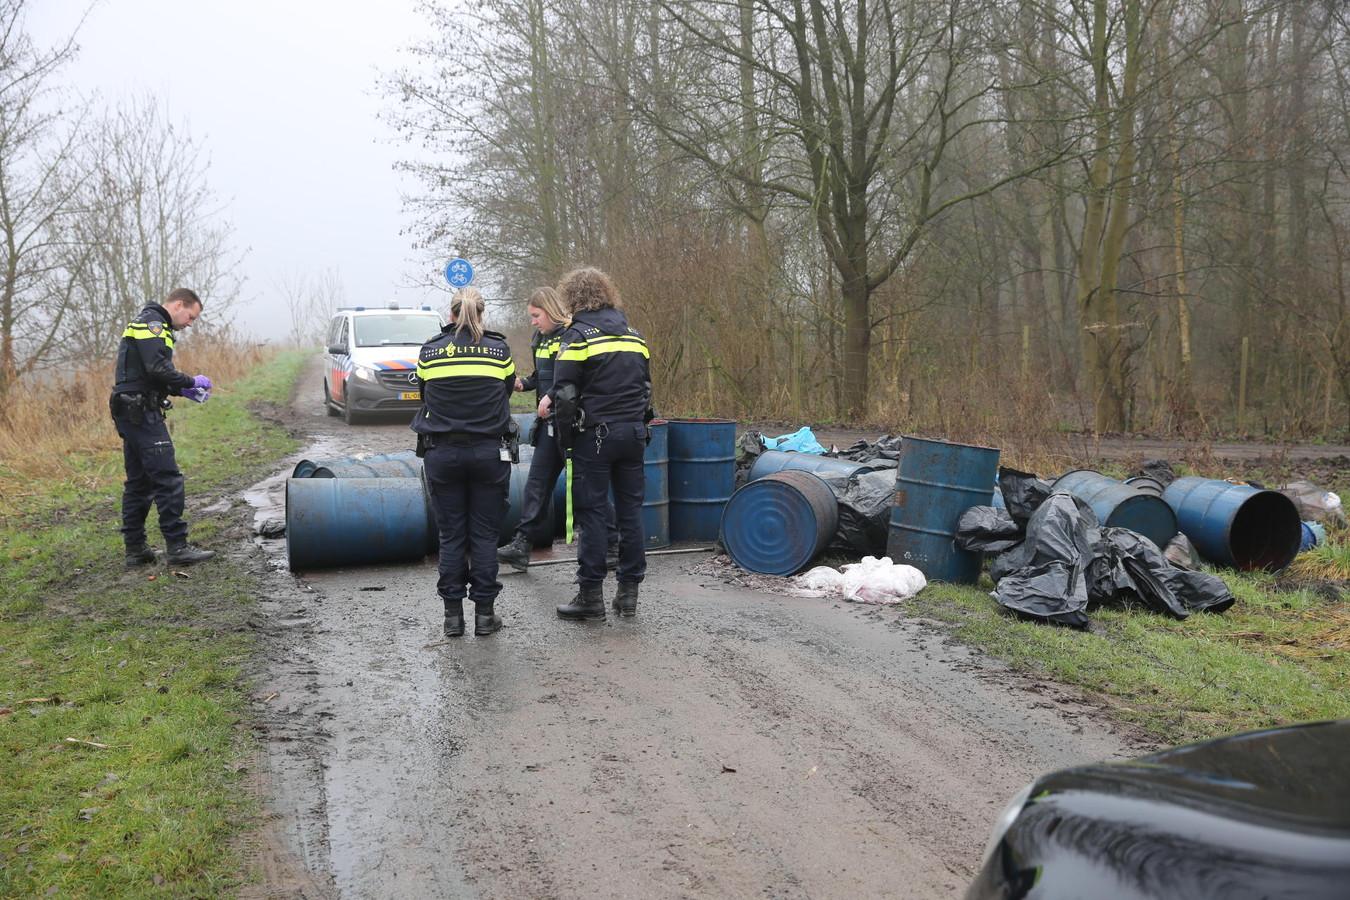 Illgeale drugsdumping in Zevenbergen.